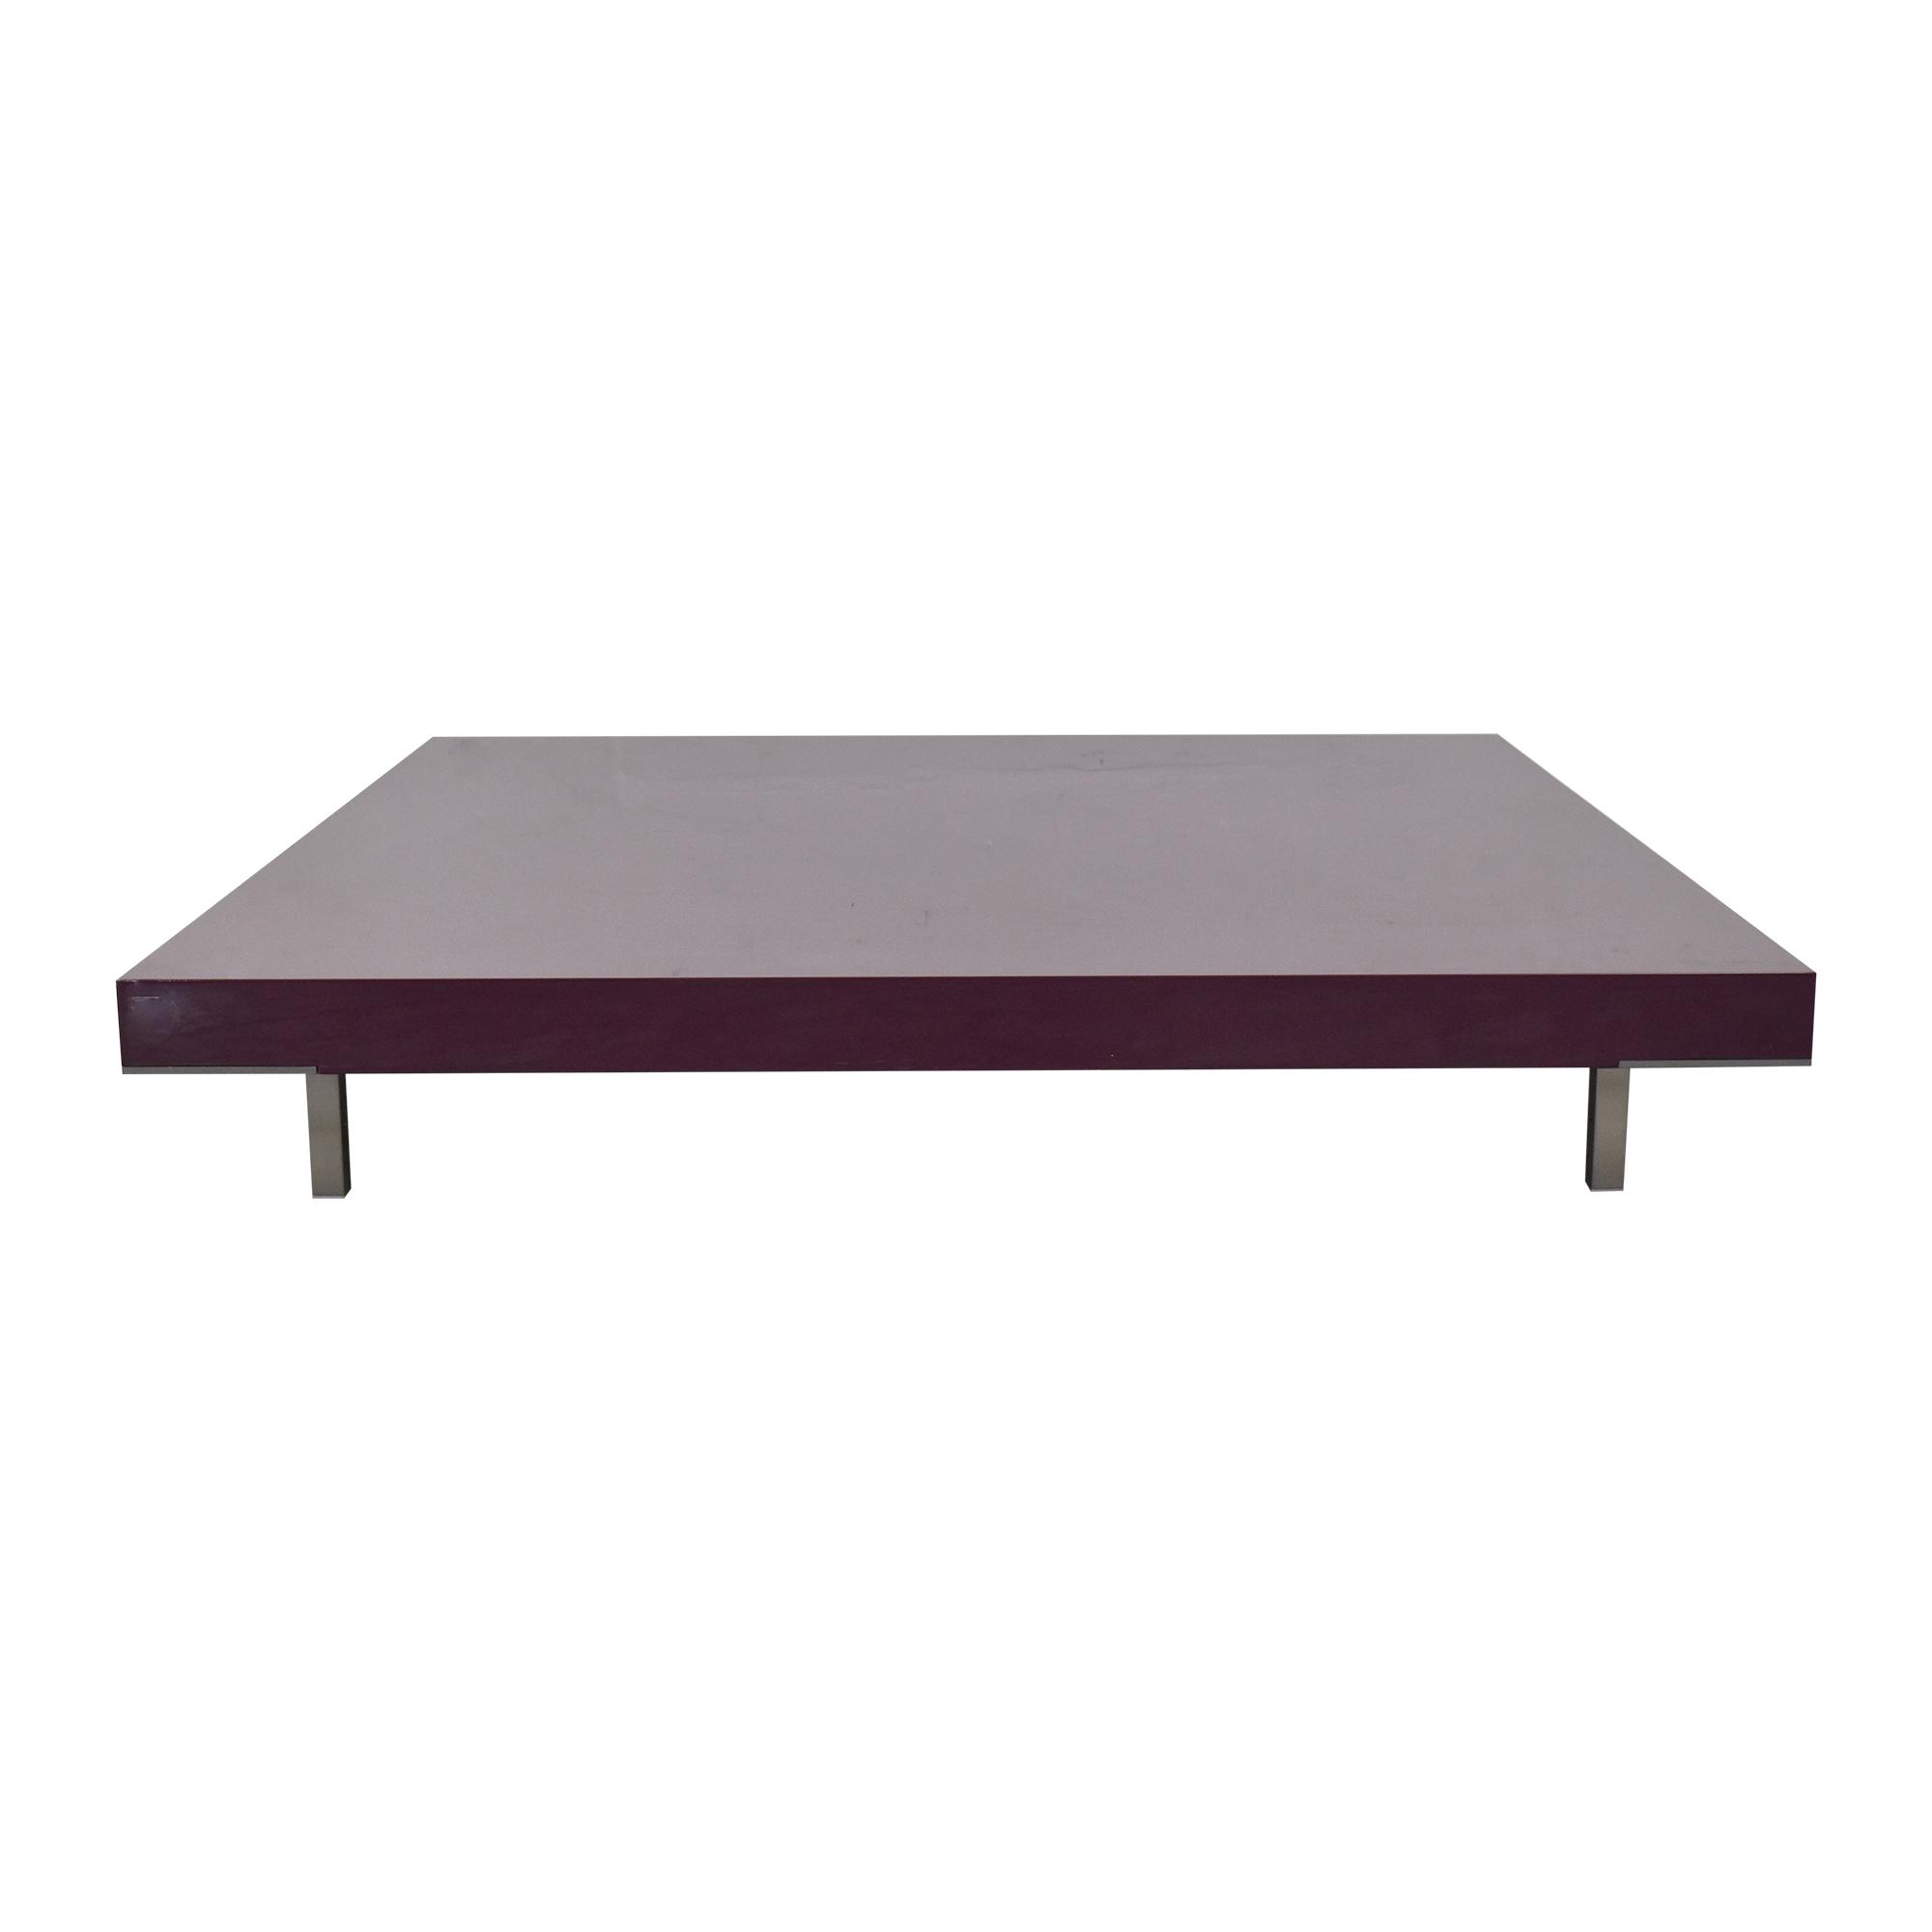 Poliform Poliform Square Coffee Table nj